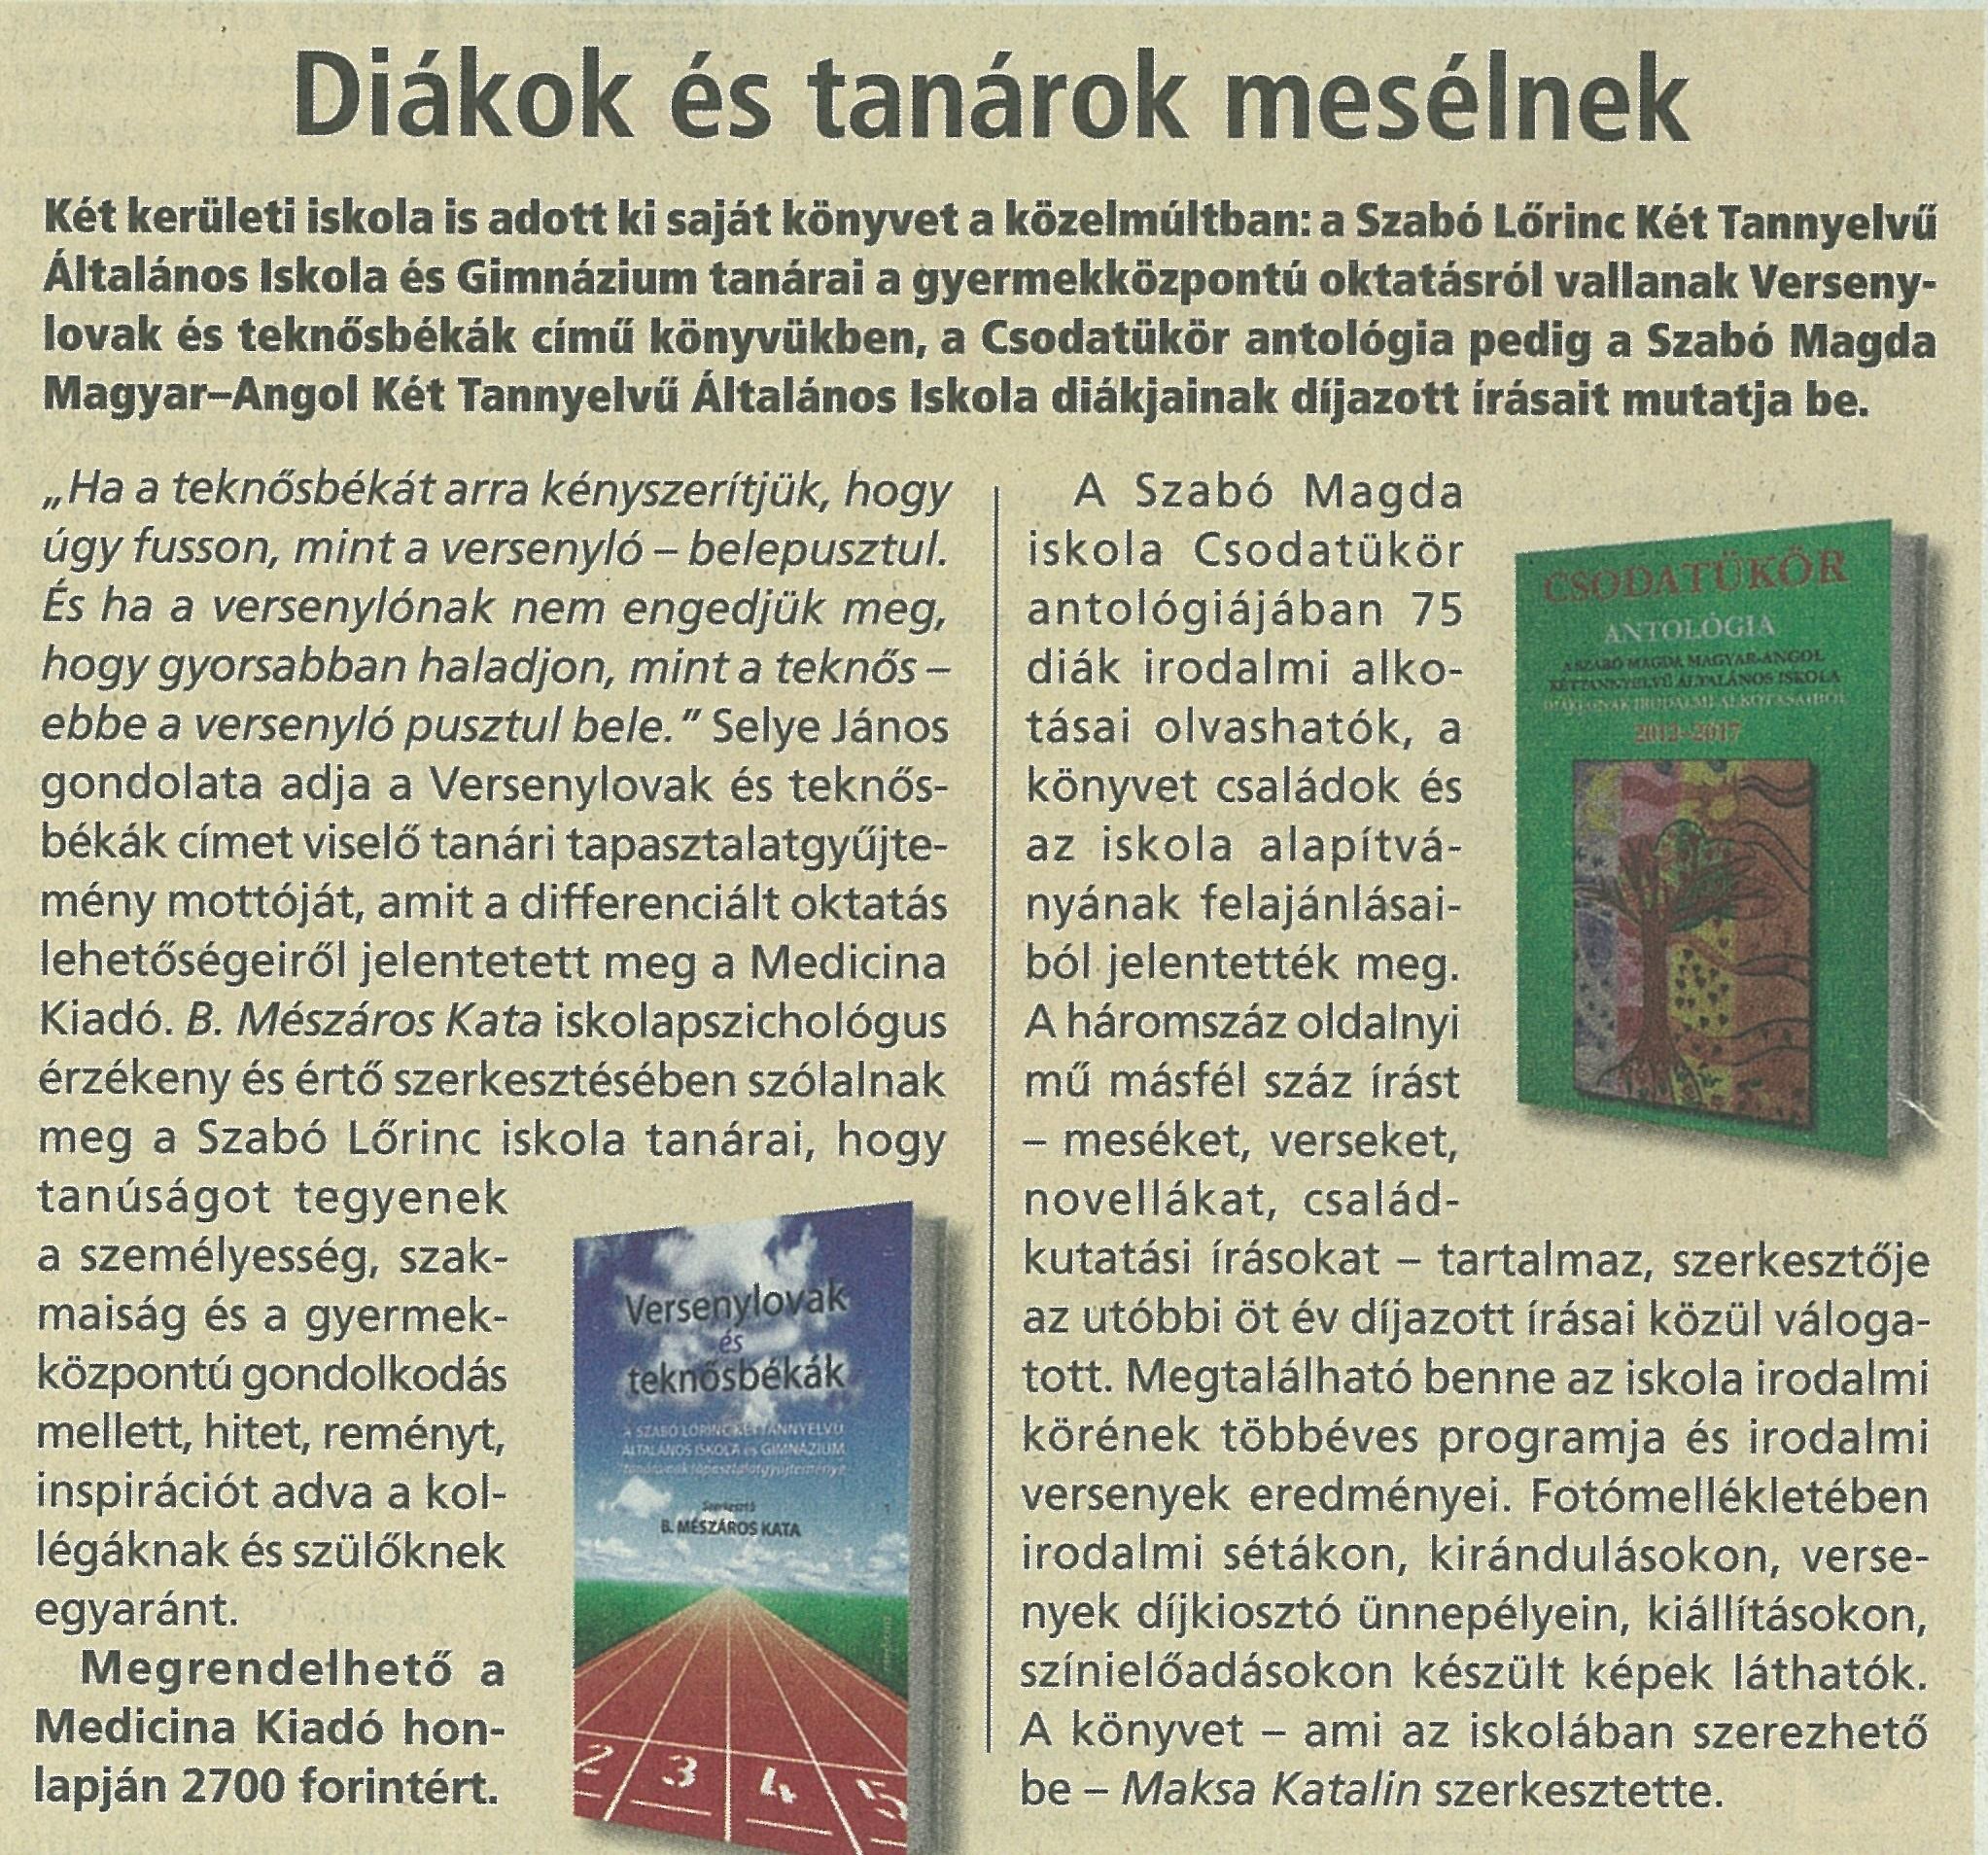 budai_polgar_2018_14_csodatukor_antologia.jpg